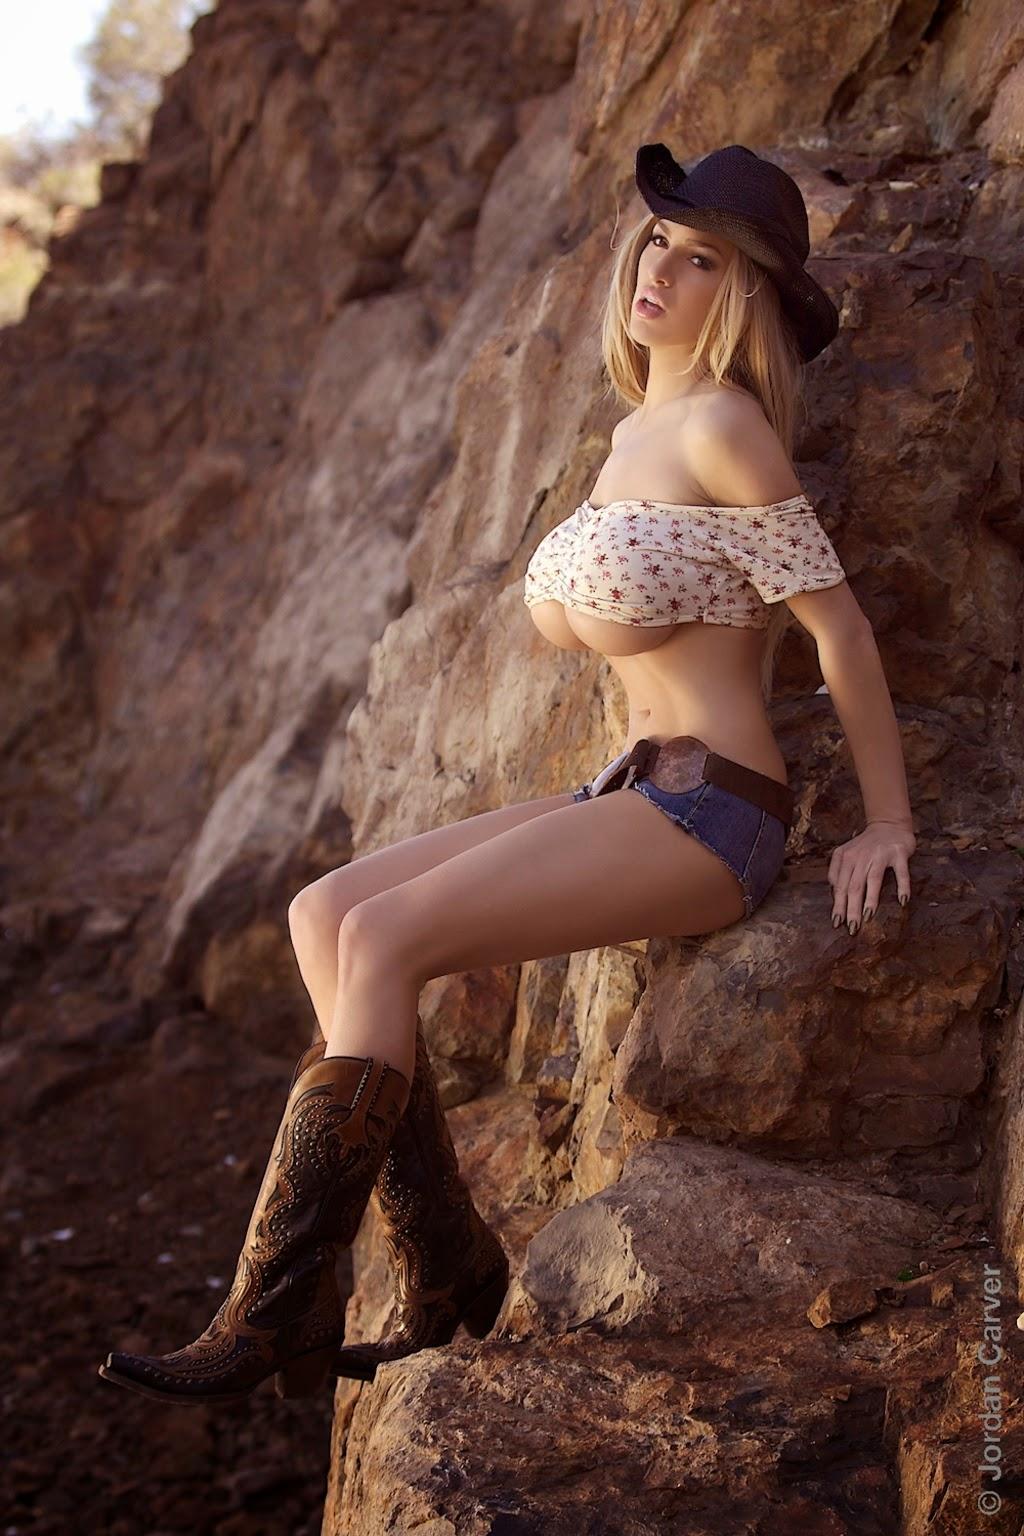 Jordan Carver Big Boobs Show In Cow Girl Baby In Desert -3282